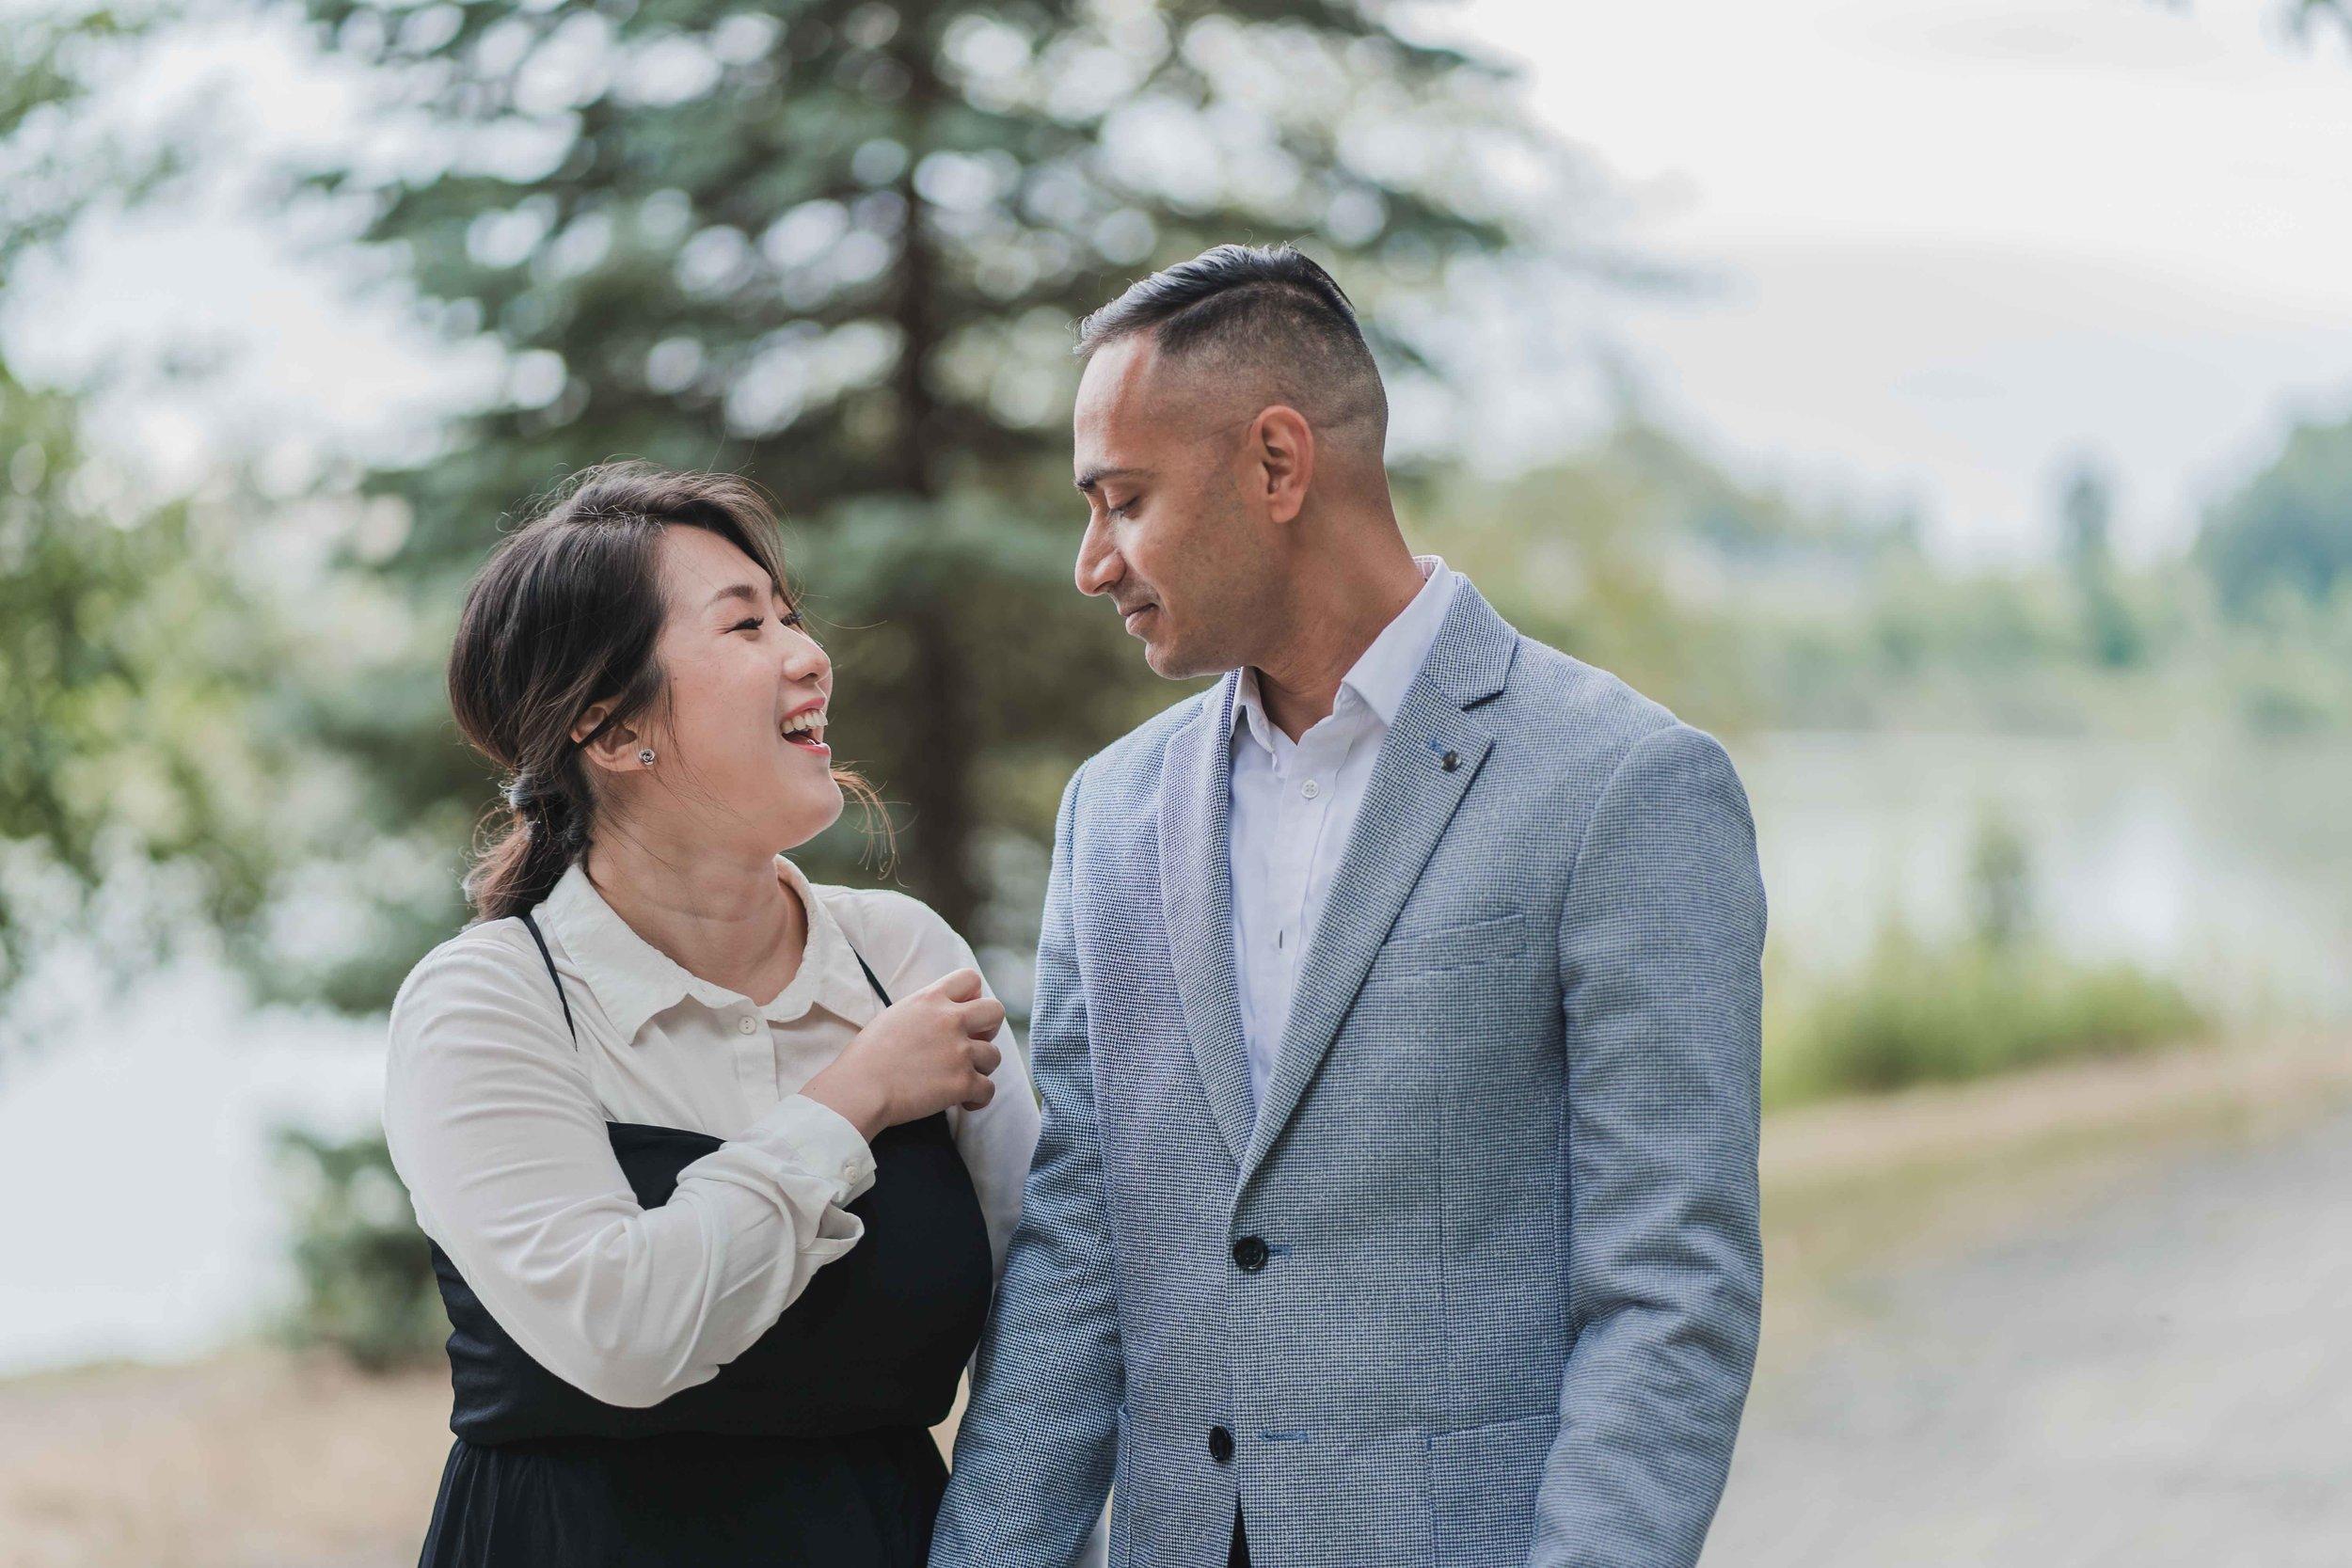 20190622 - Monika & Johnson Engagement - 0094.jpg